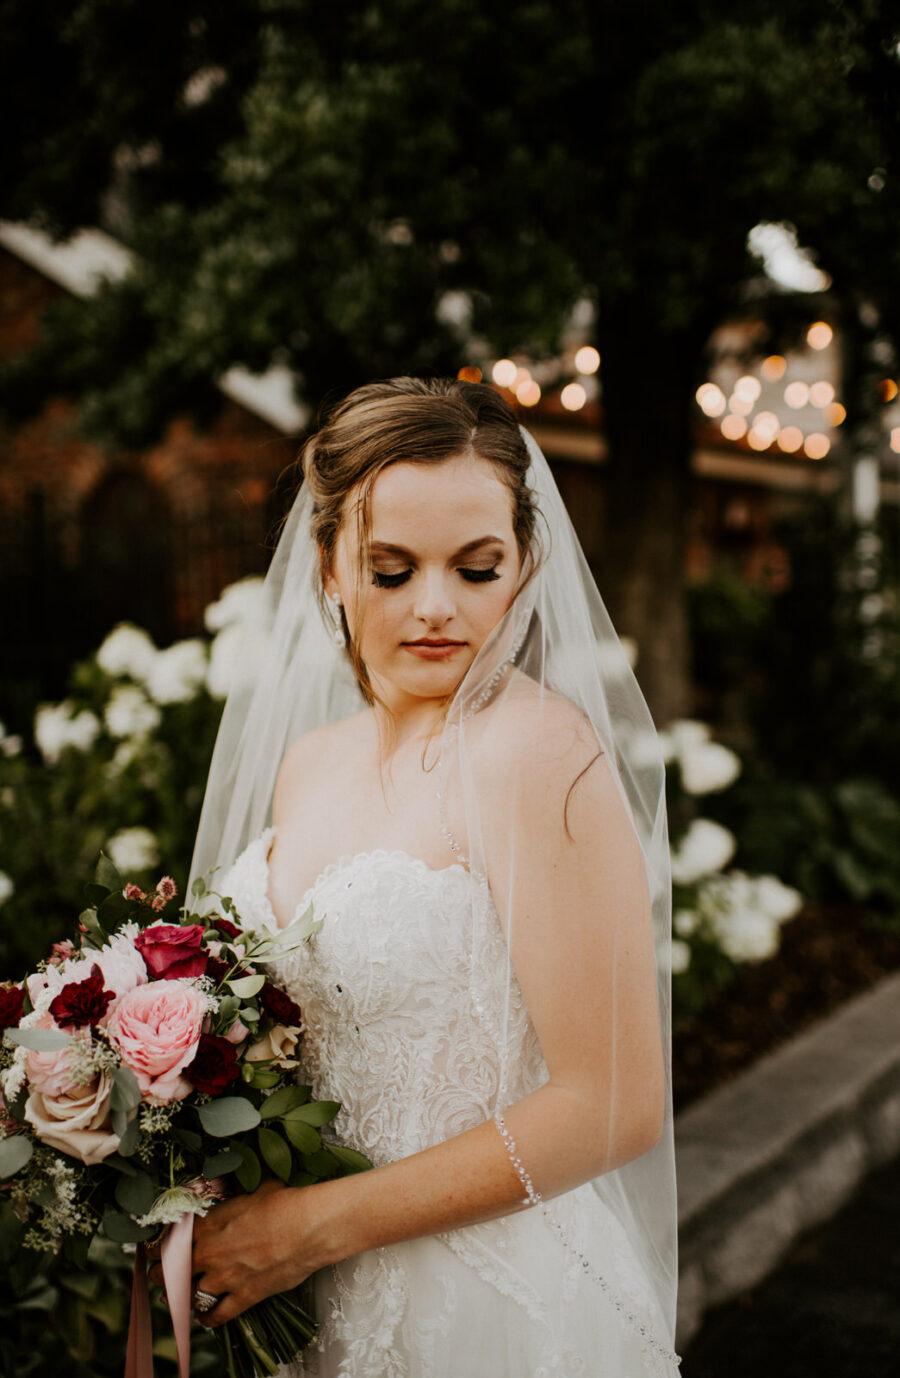 Bridal portrait: Romantic Nashville Wedding at The Bedford featured on Nashville Bride Guide